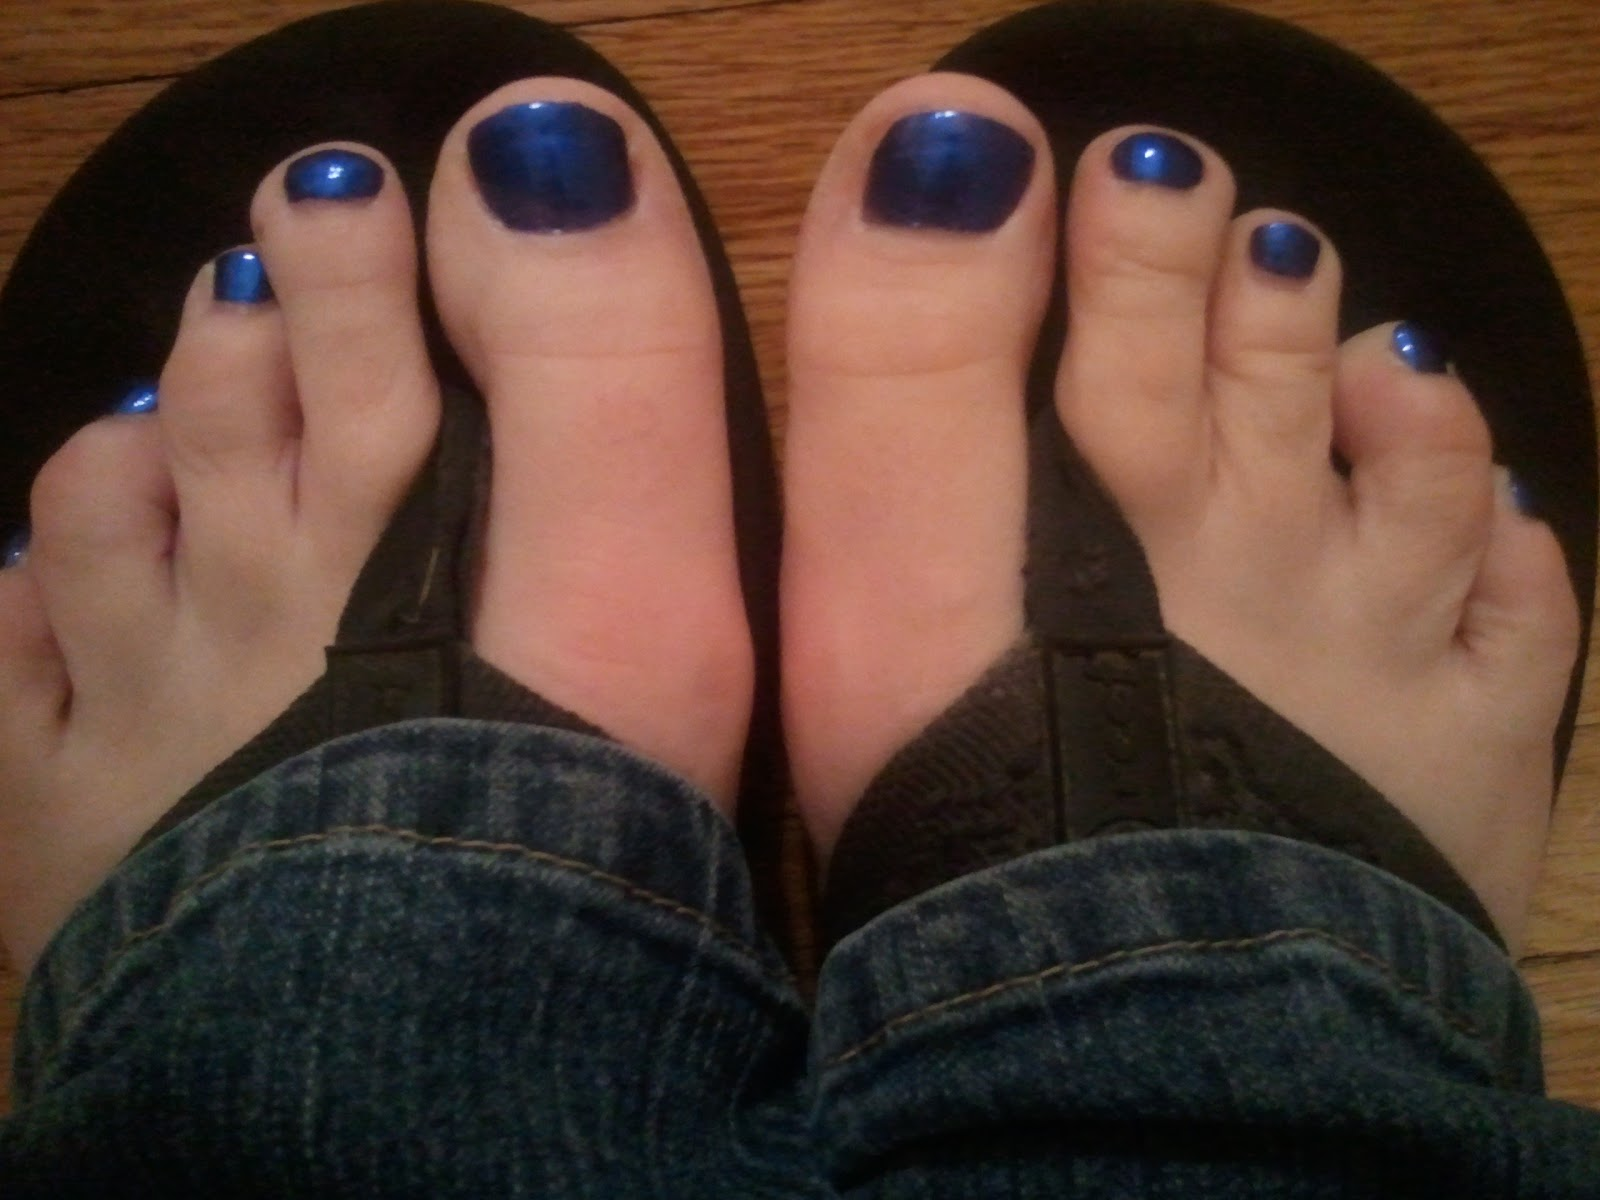 chubby chicks run too: blue toes